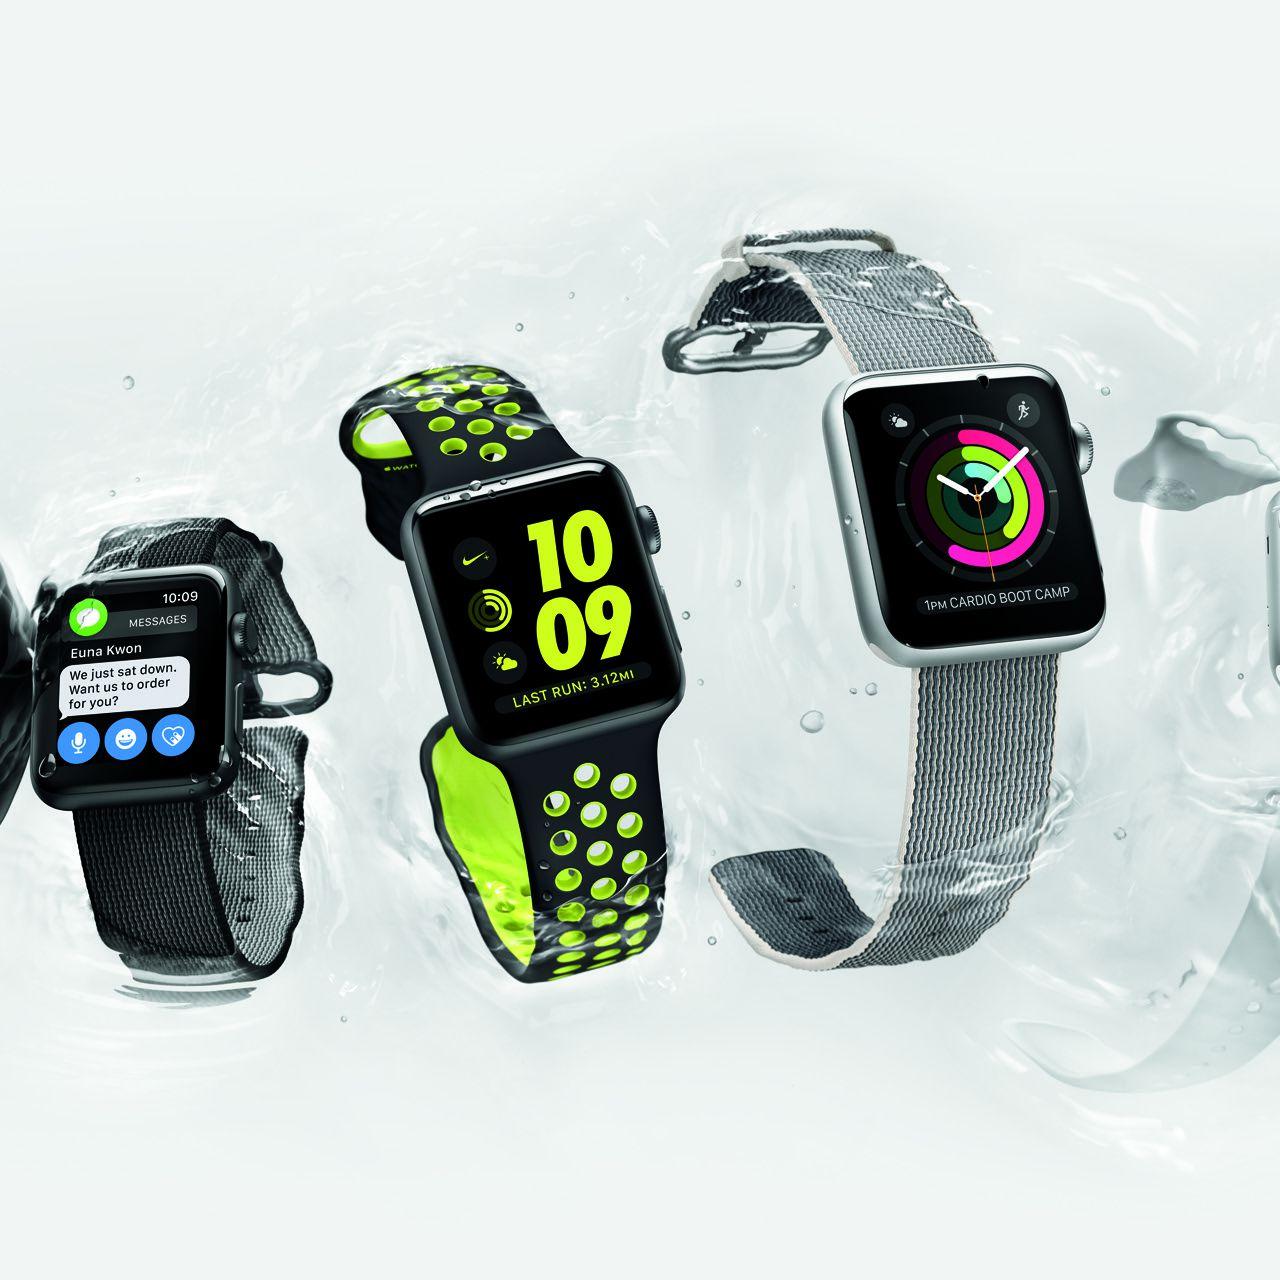 Unique Apple Watch Apps Everyone Should Have